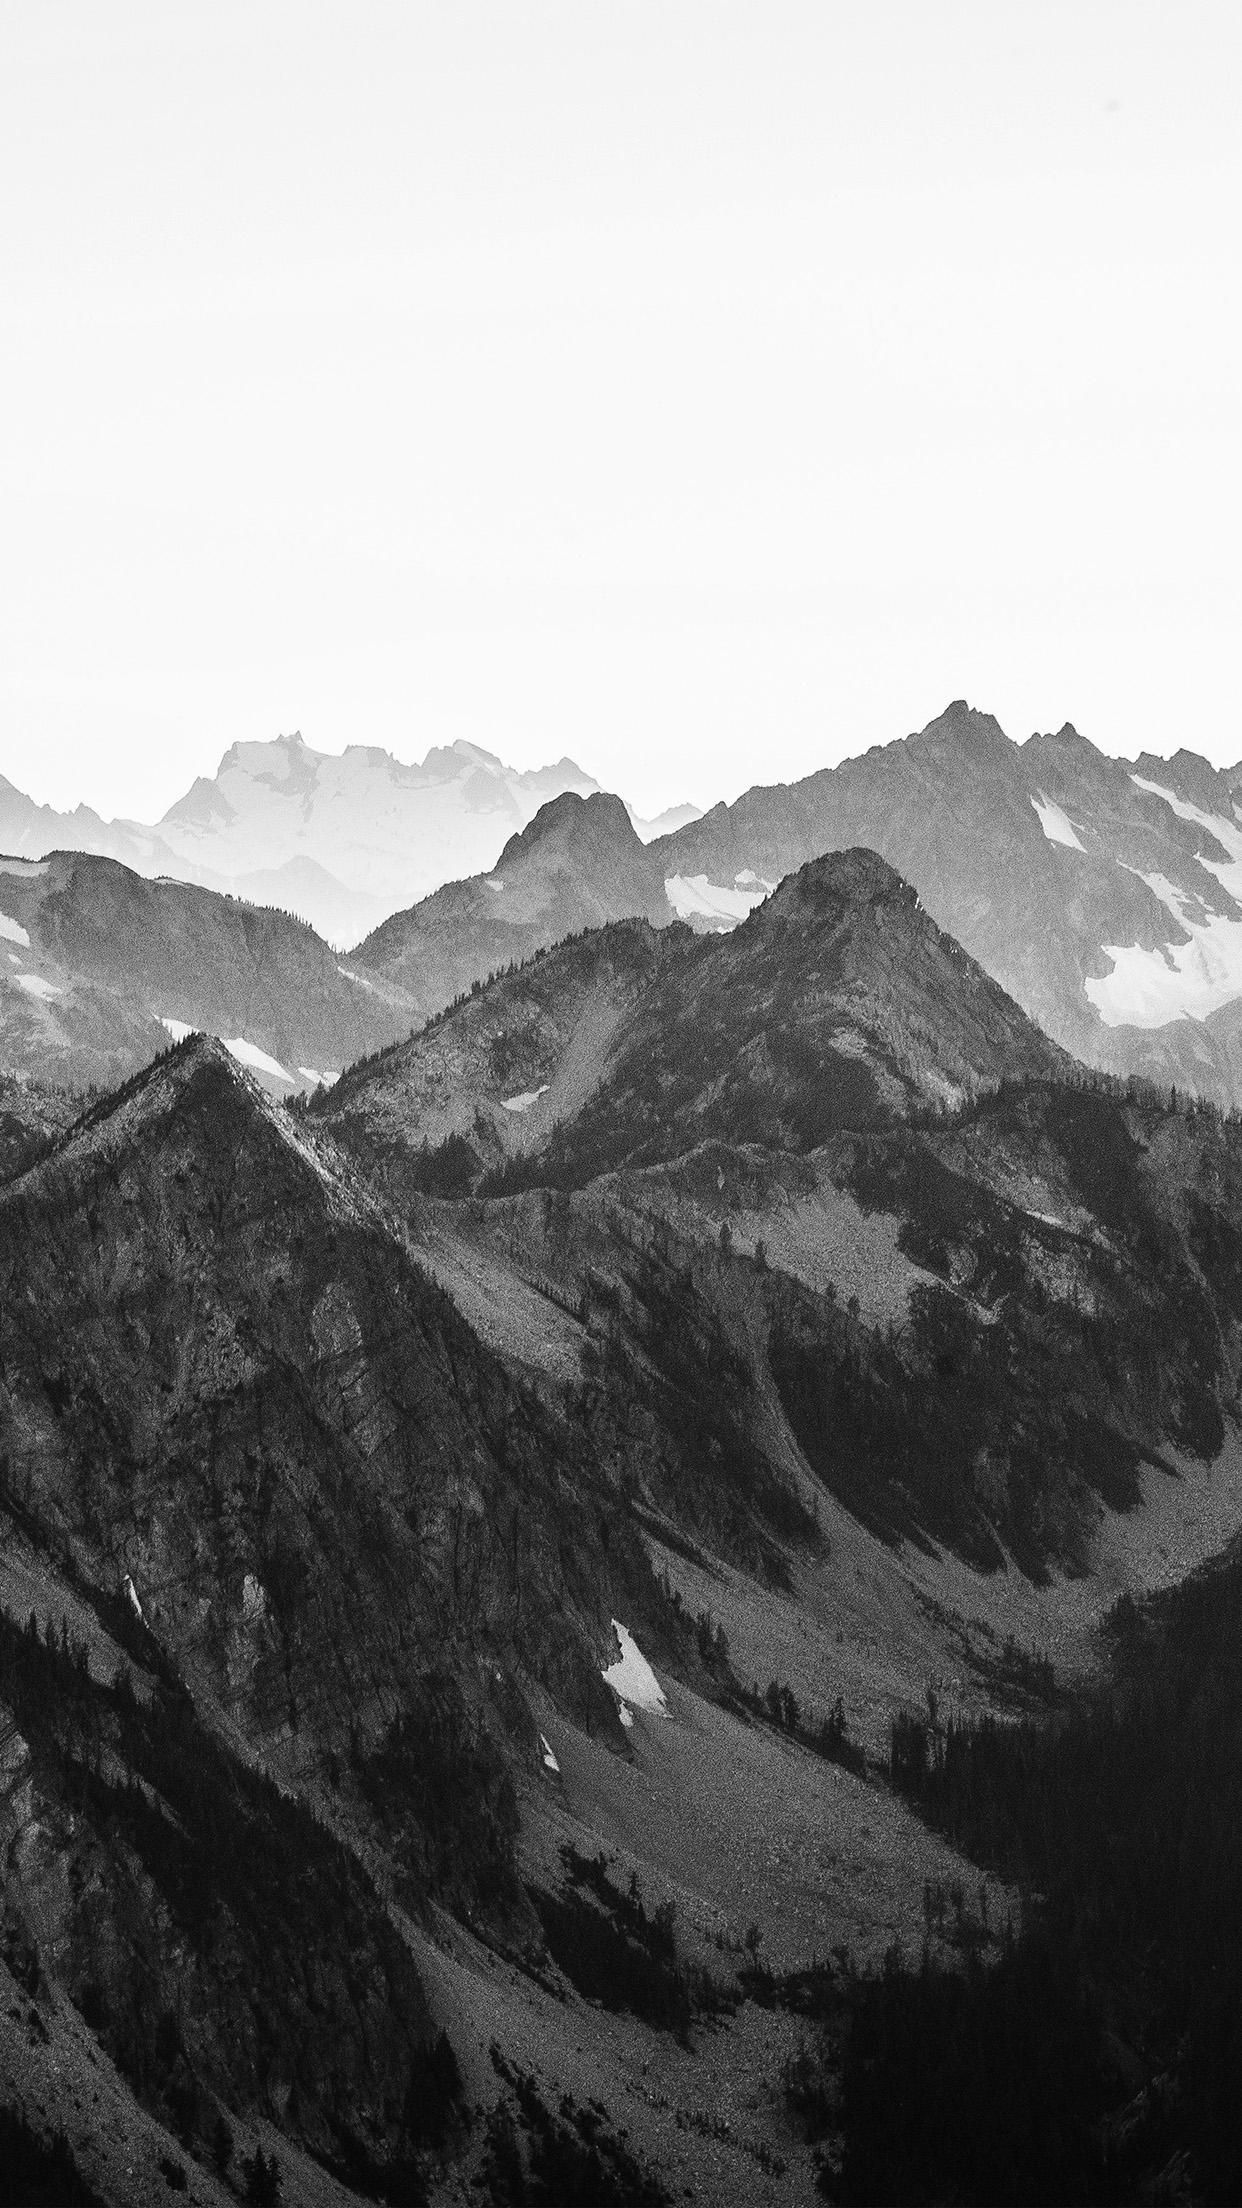 Black Mountain Wallpaper Iphone Hd Wallpaper For Desktop